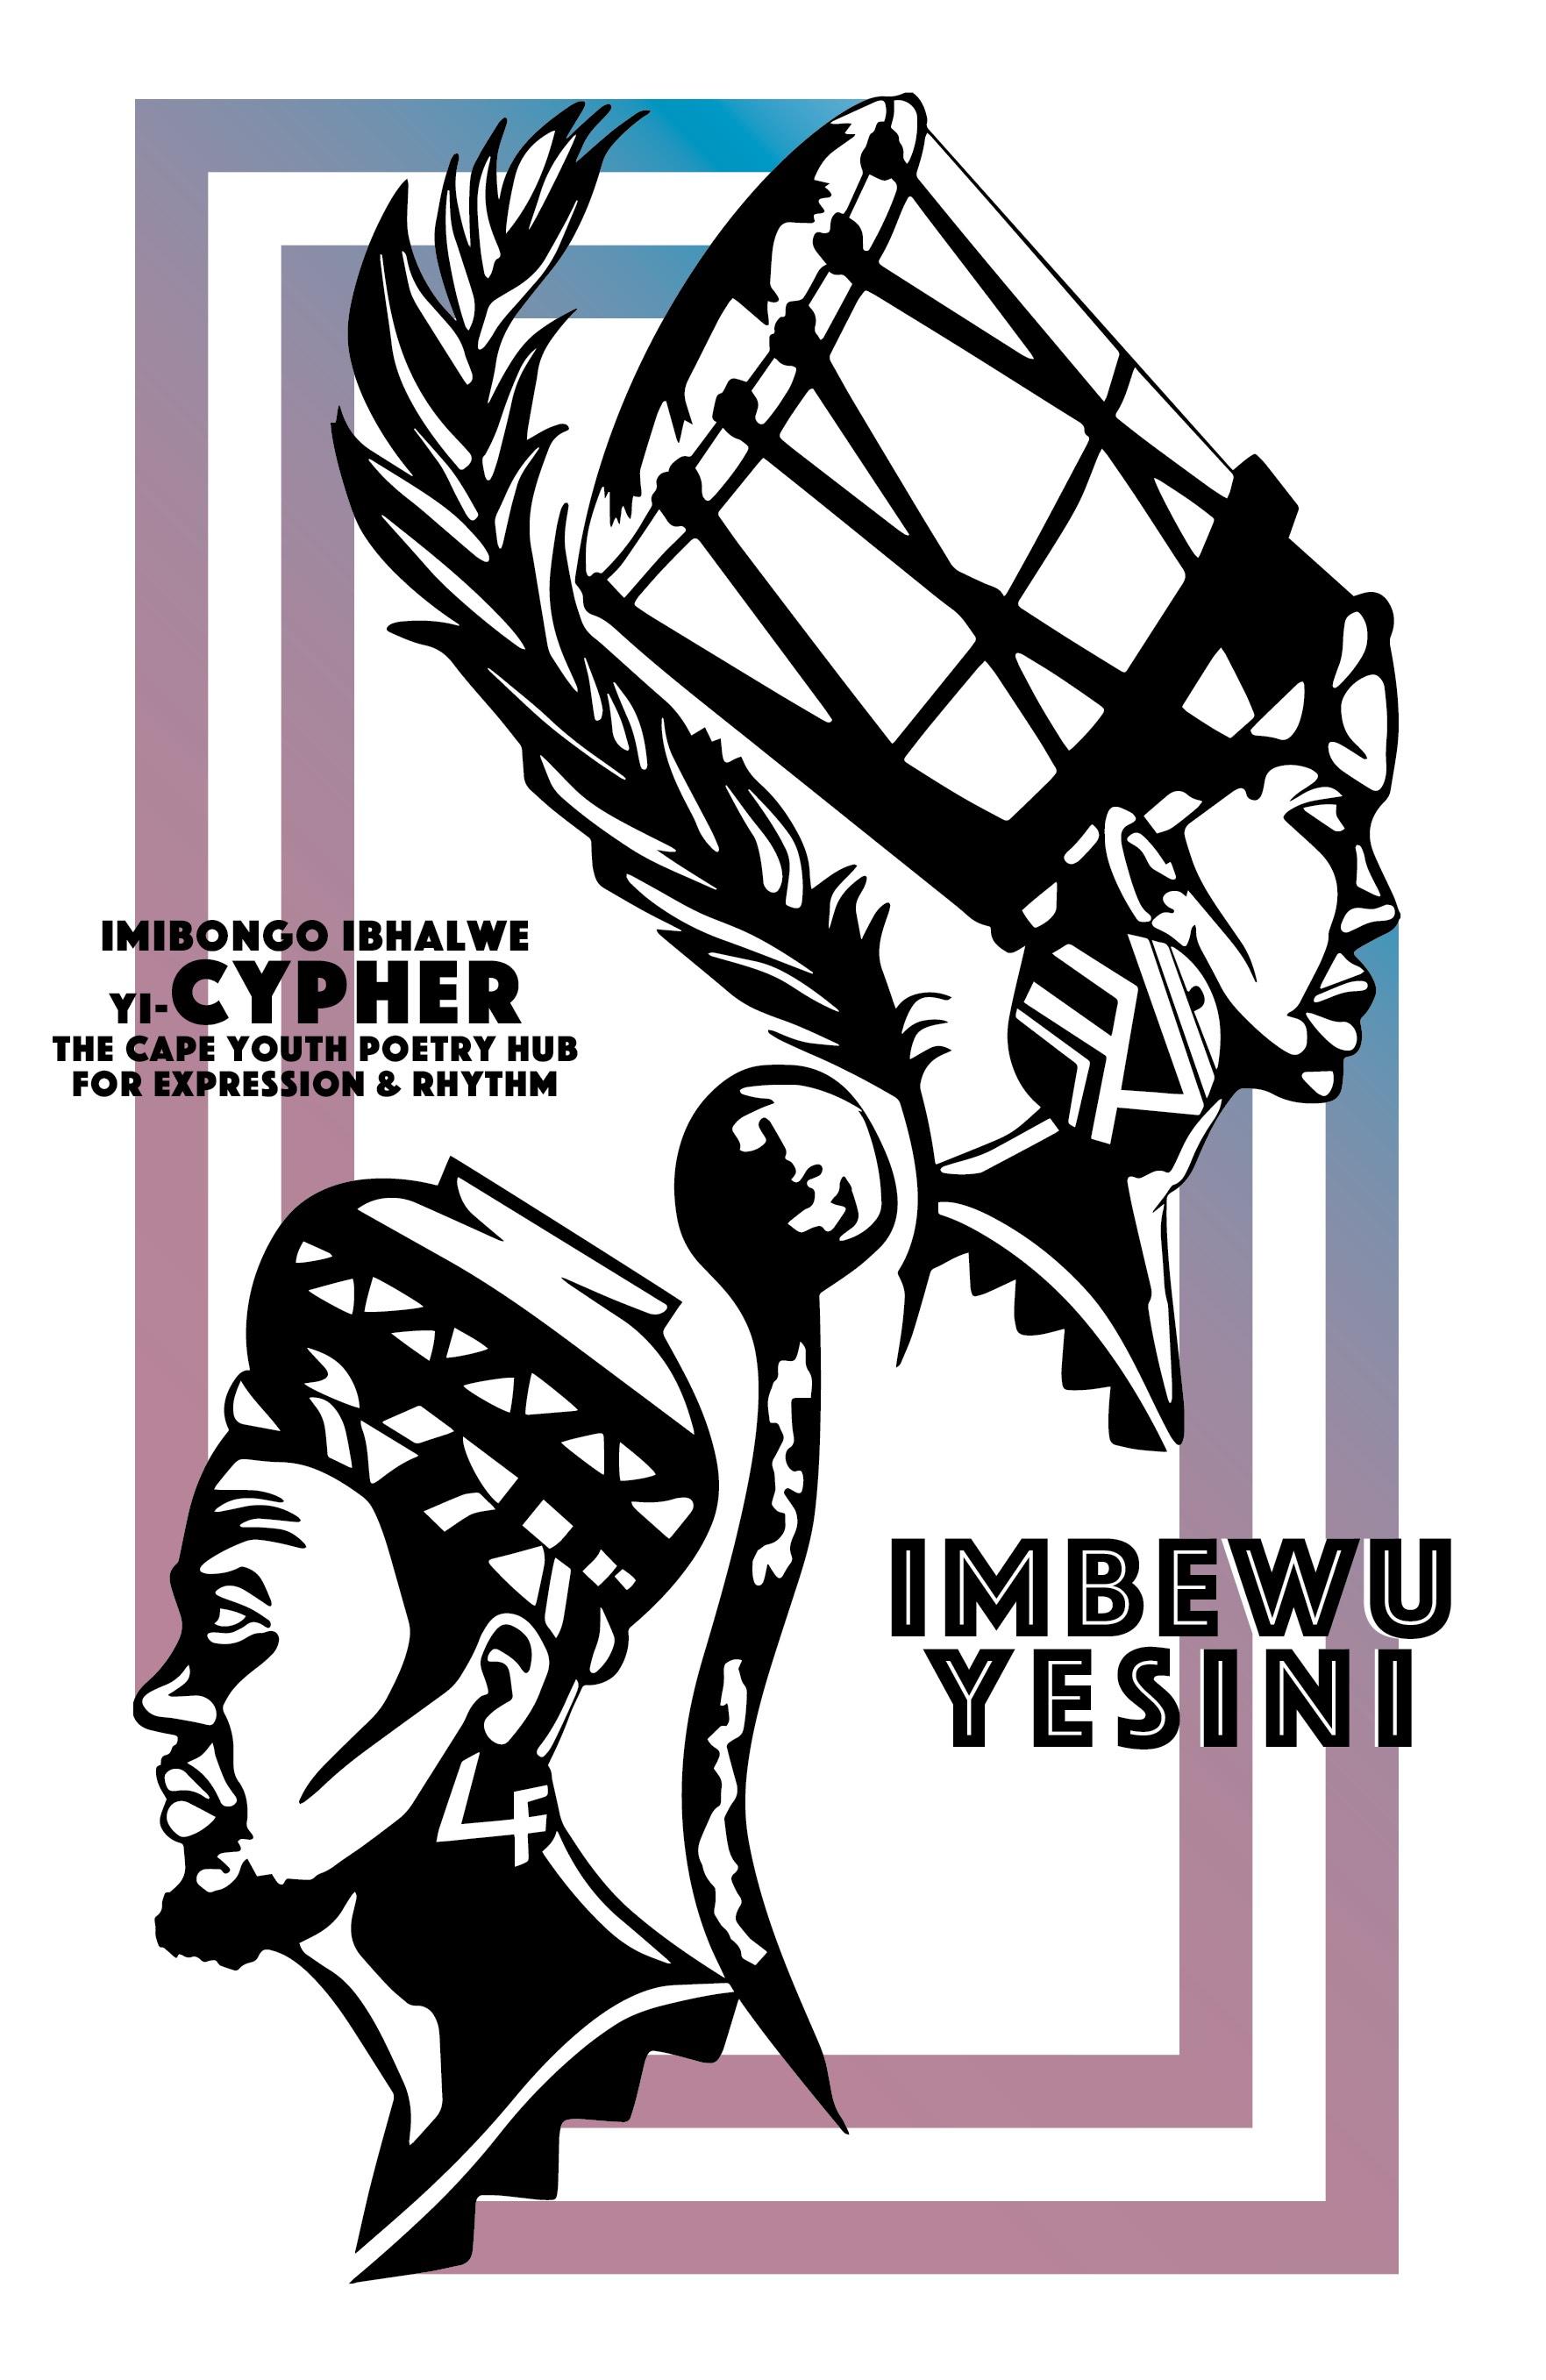 imbewu-yesini-front-cover